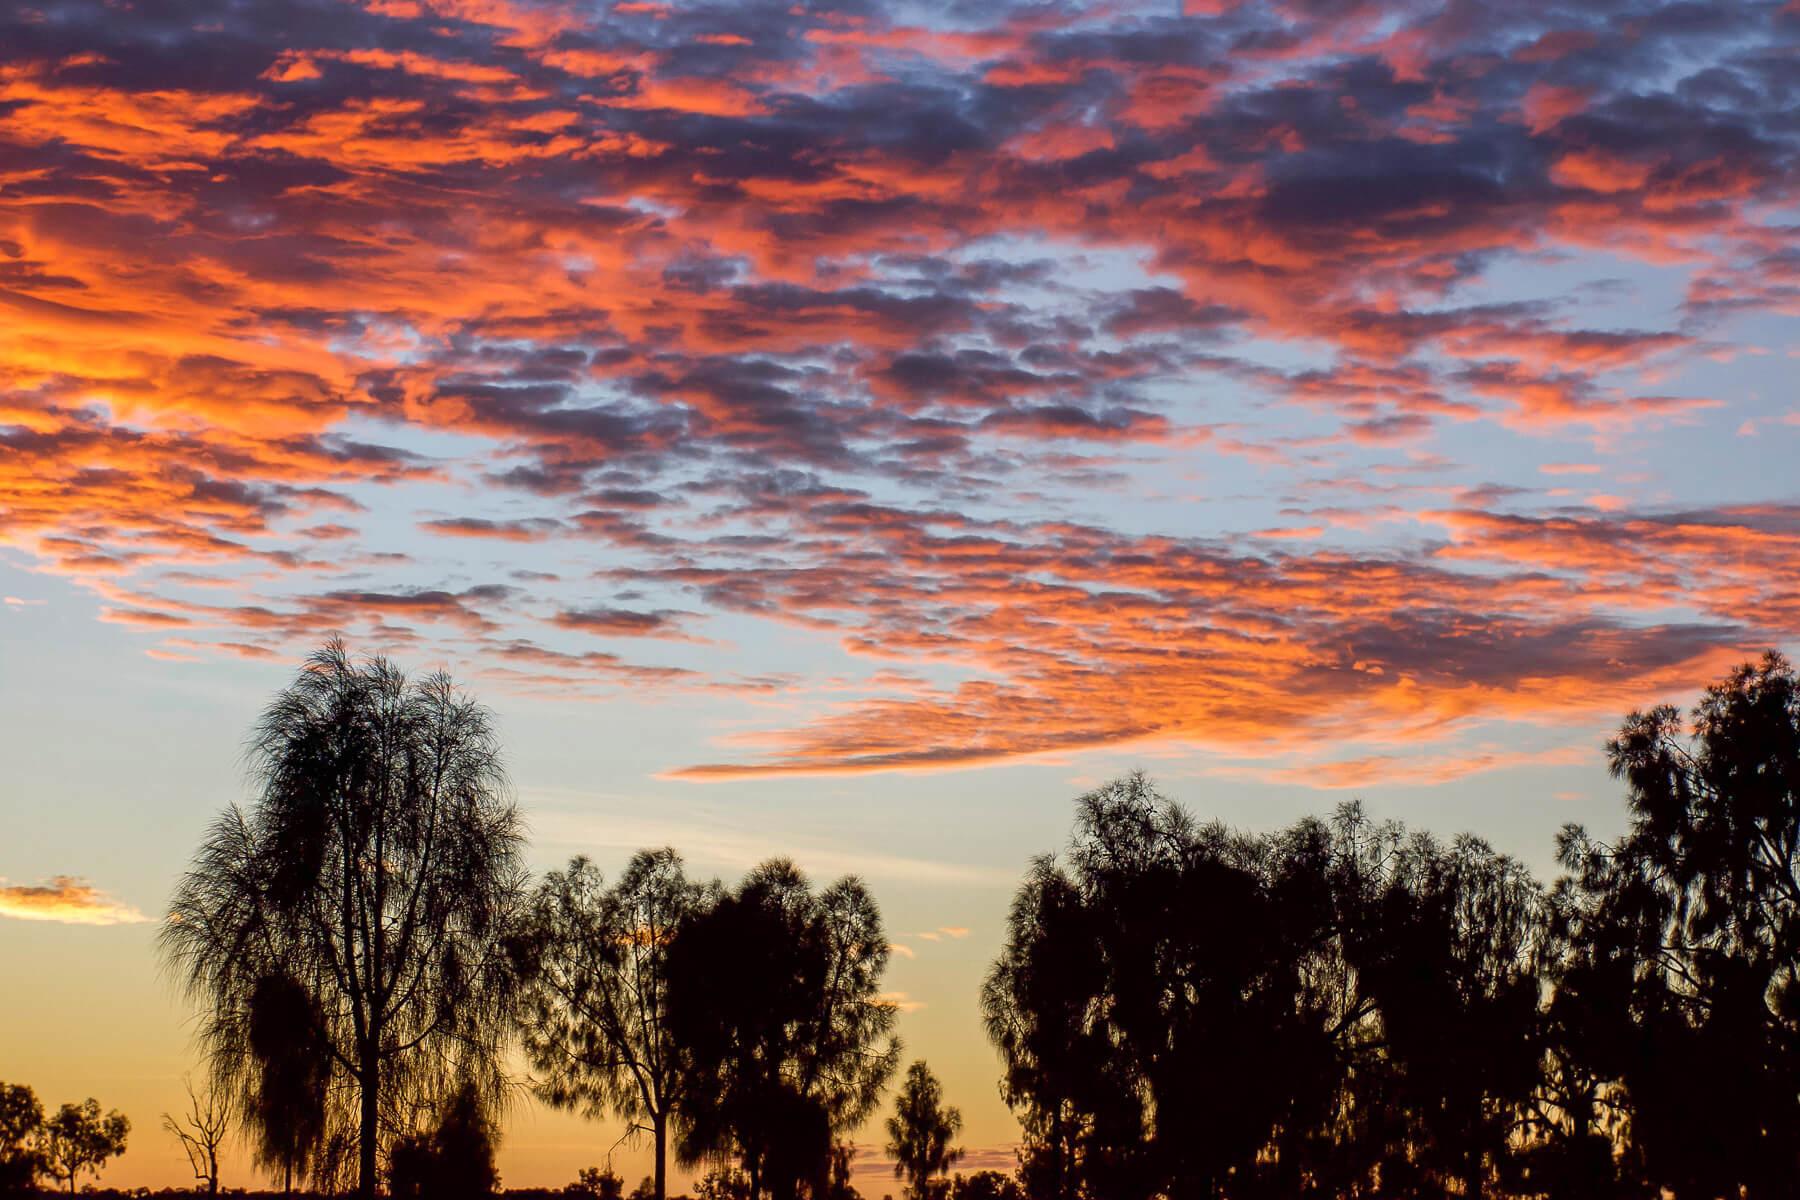 Bright Orange clouds as the sun rises